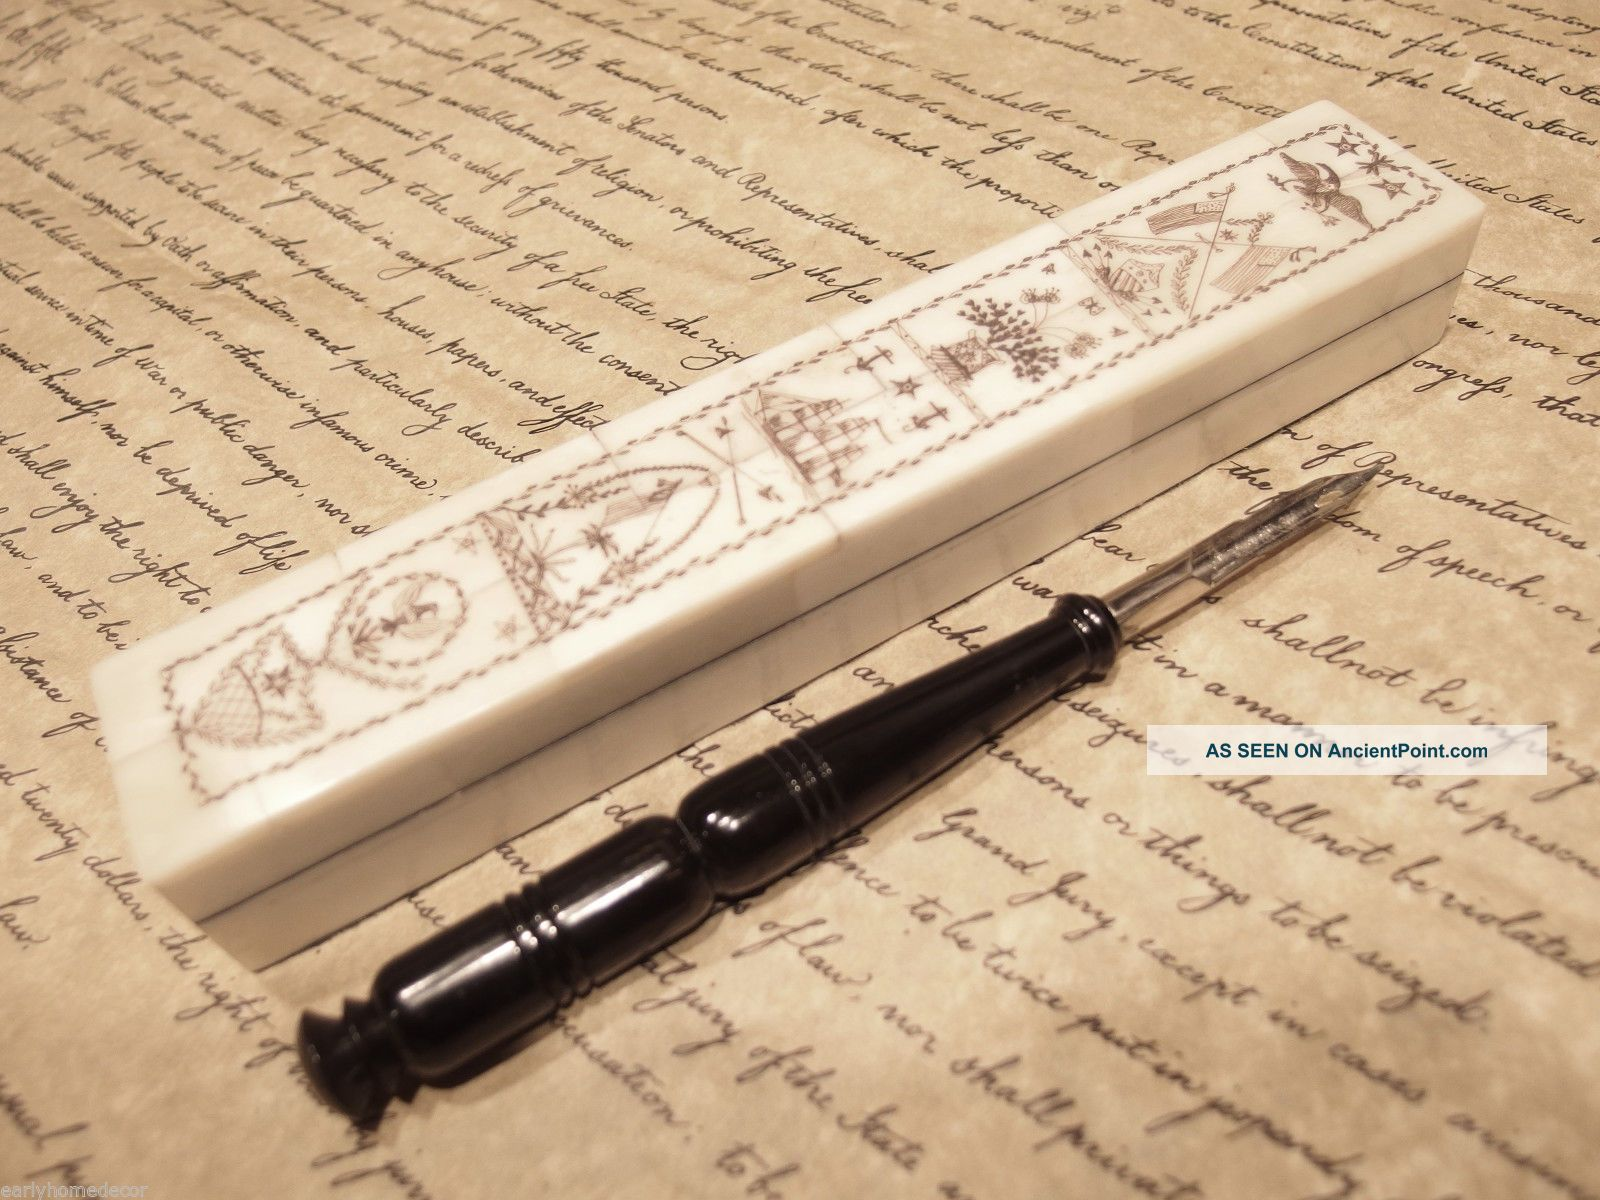 Antique Style Folk Art Americana Scrimshaw Bone & Wood Pen Box W Horn Dip Pen Scrimshaws photo